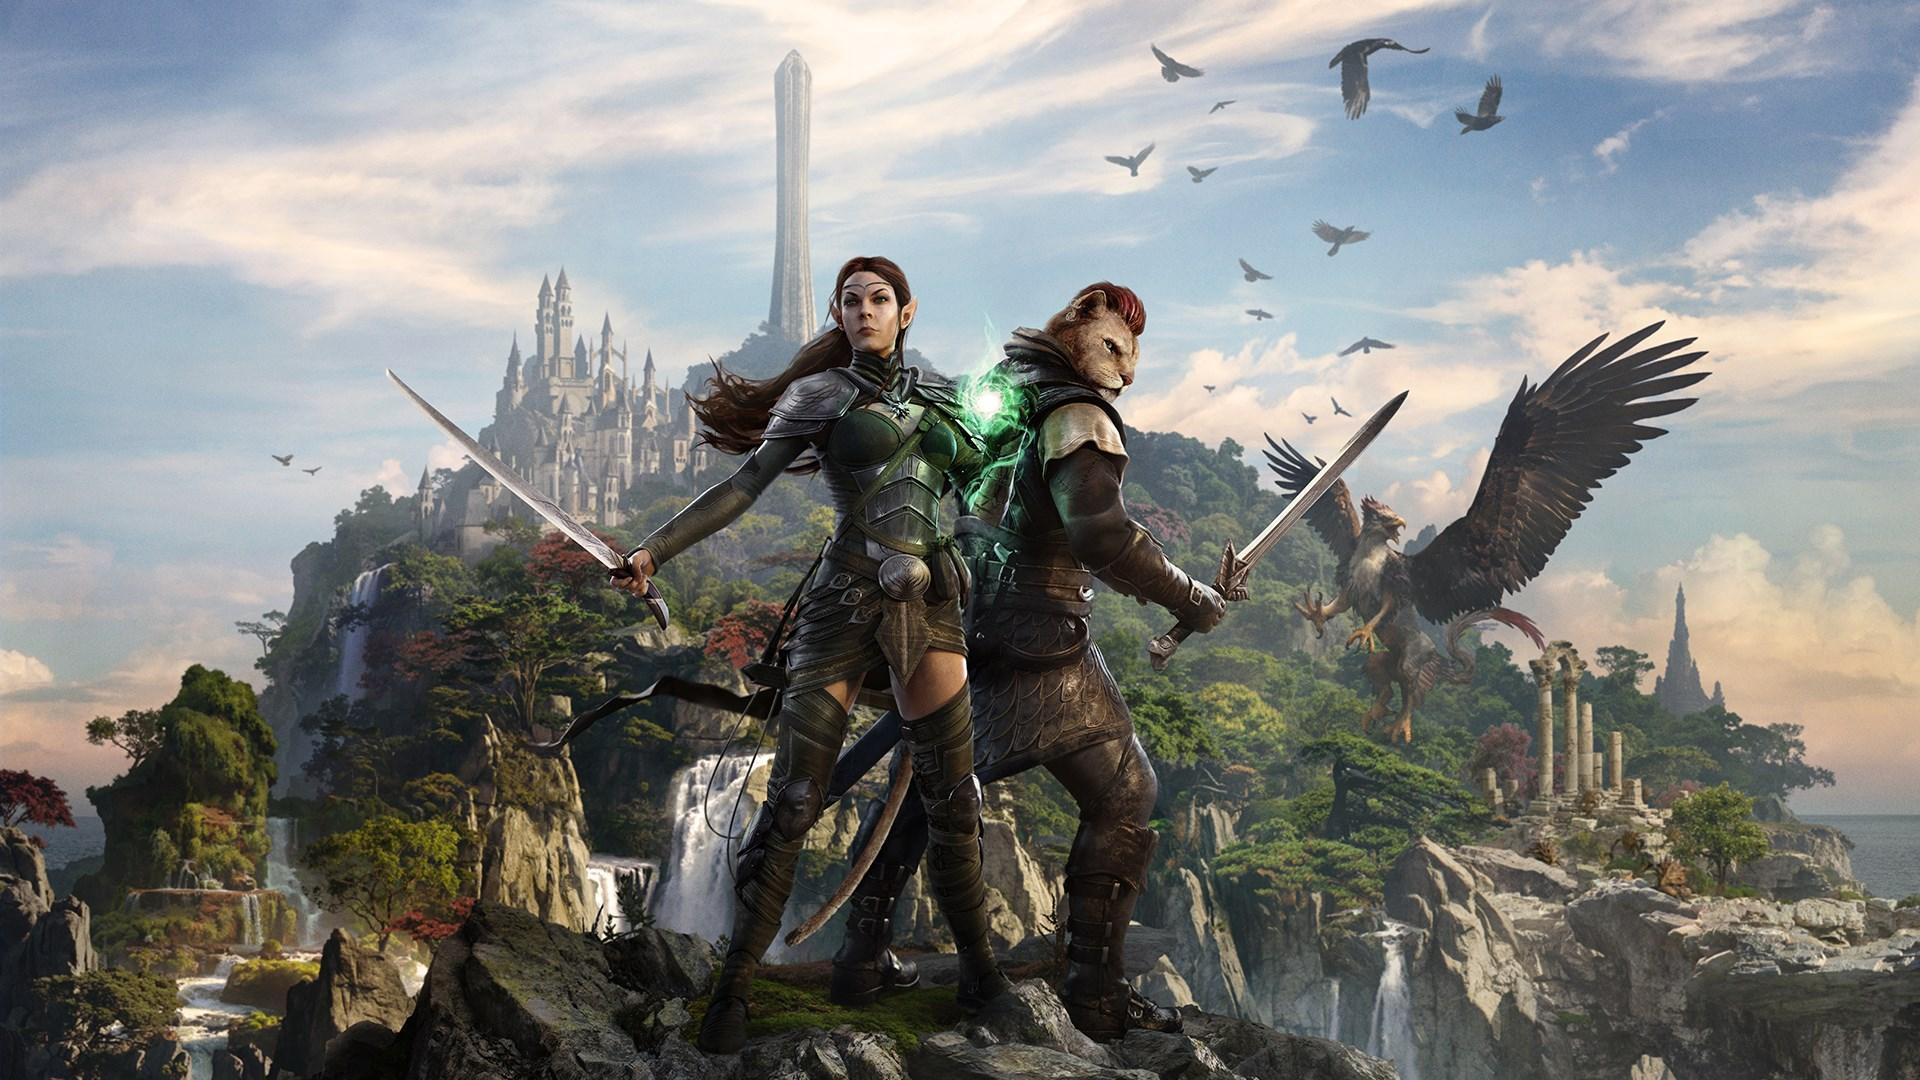 The Elder Scrolls Online: Summerset Review - Vida Elevada (Elfa) em ...